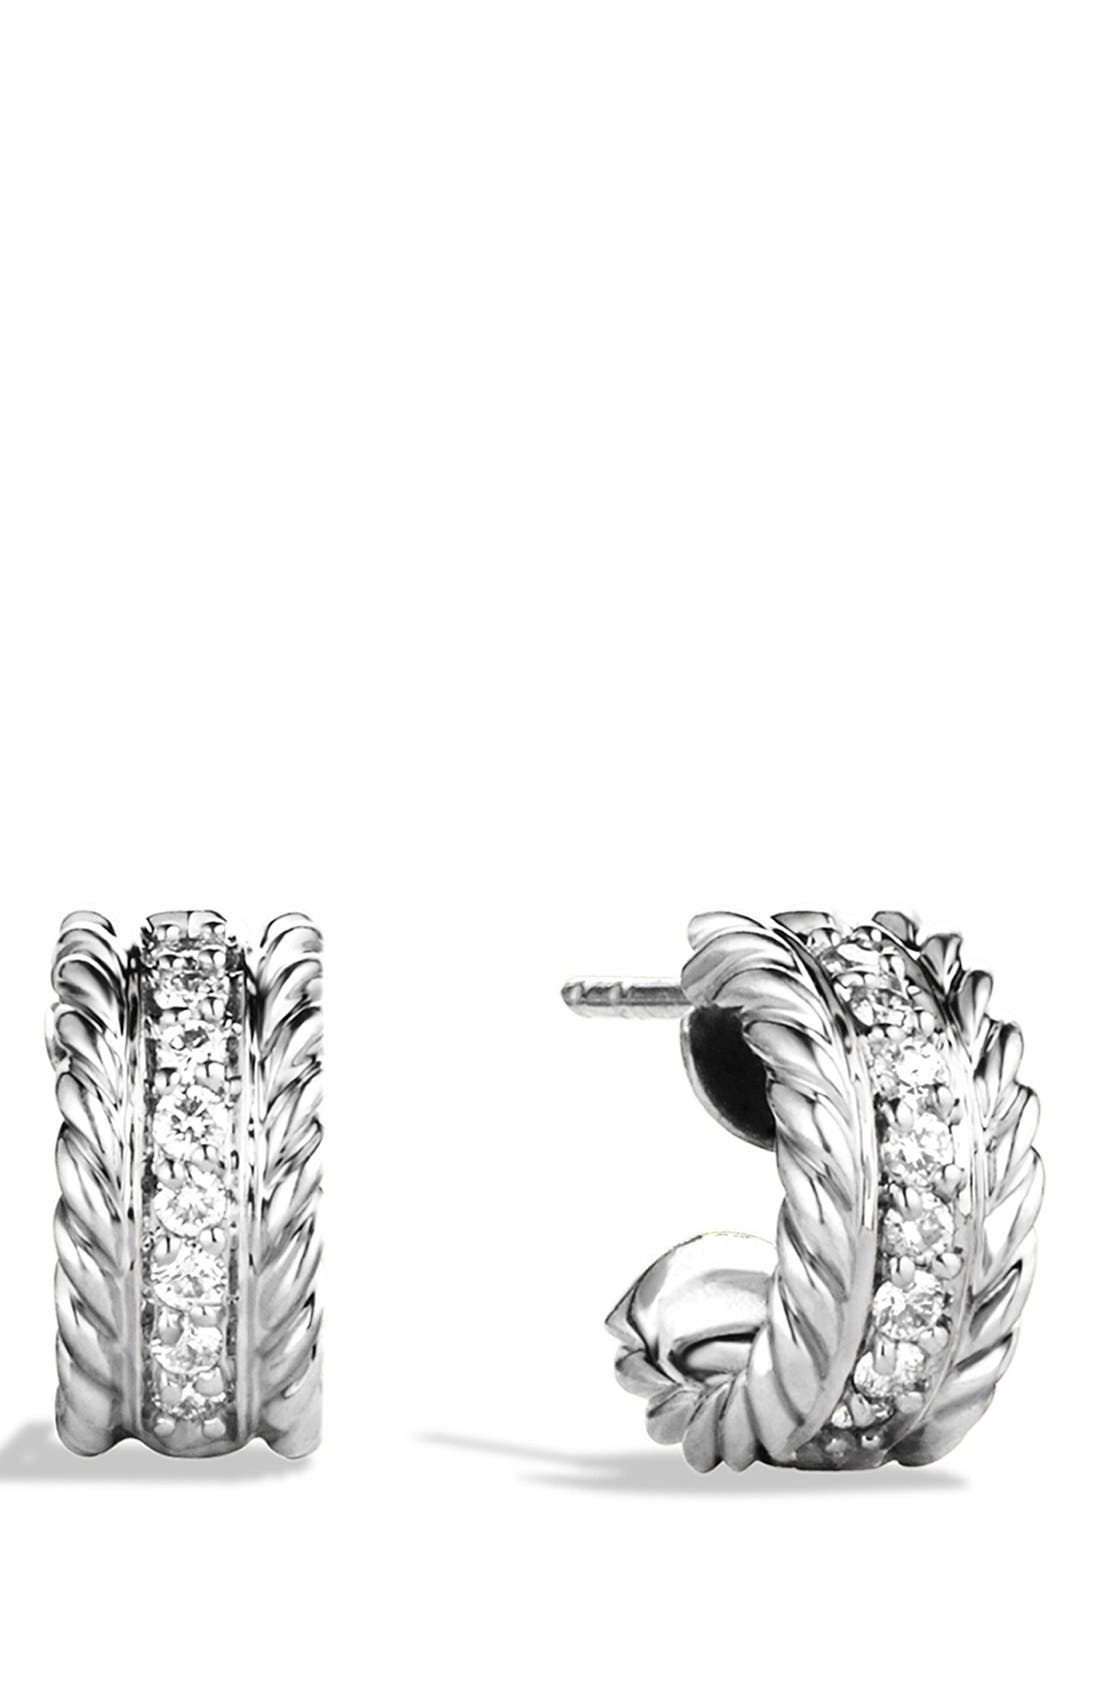 david yurman u0027cable extrasmall earrings with diamonds